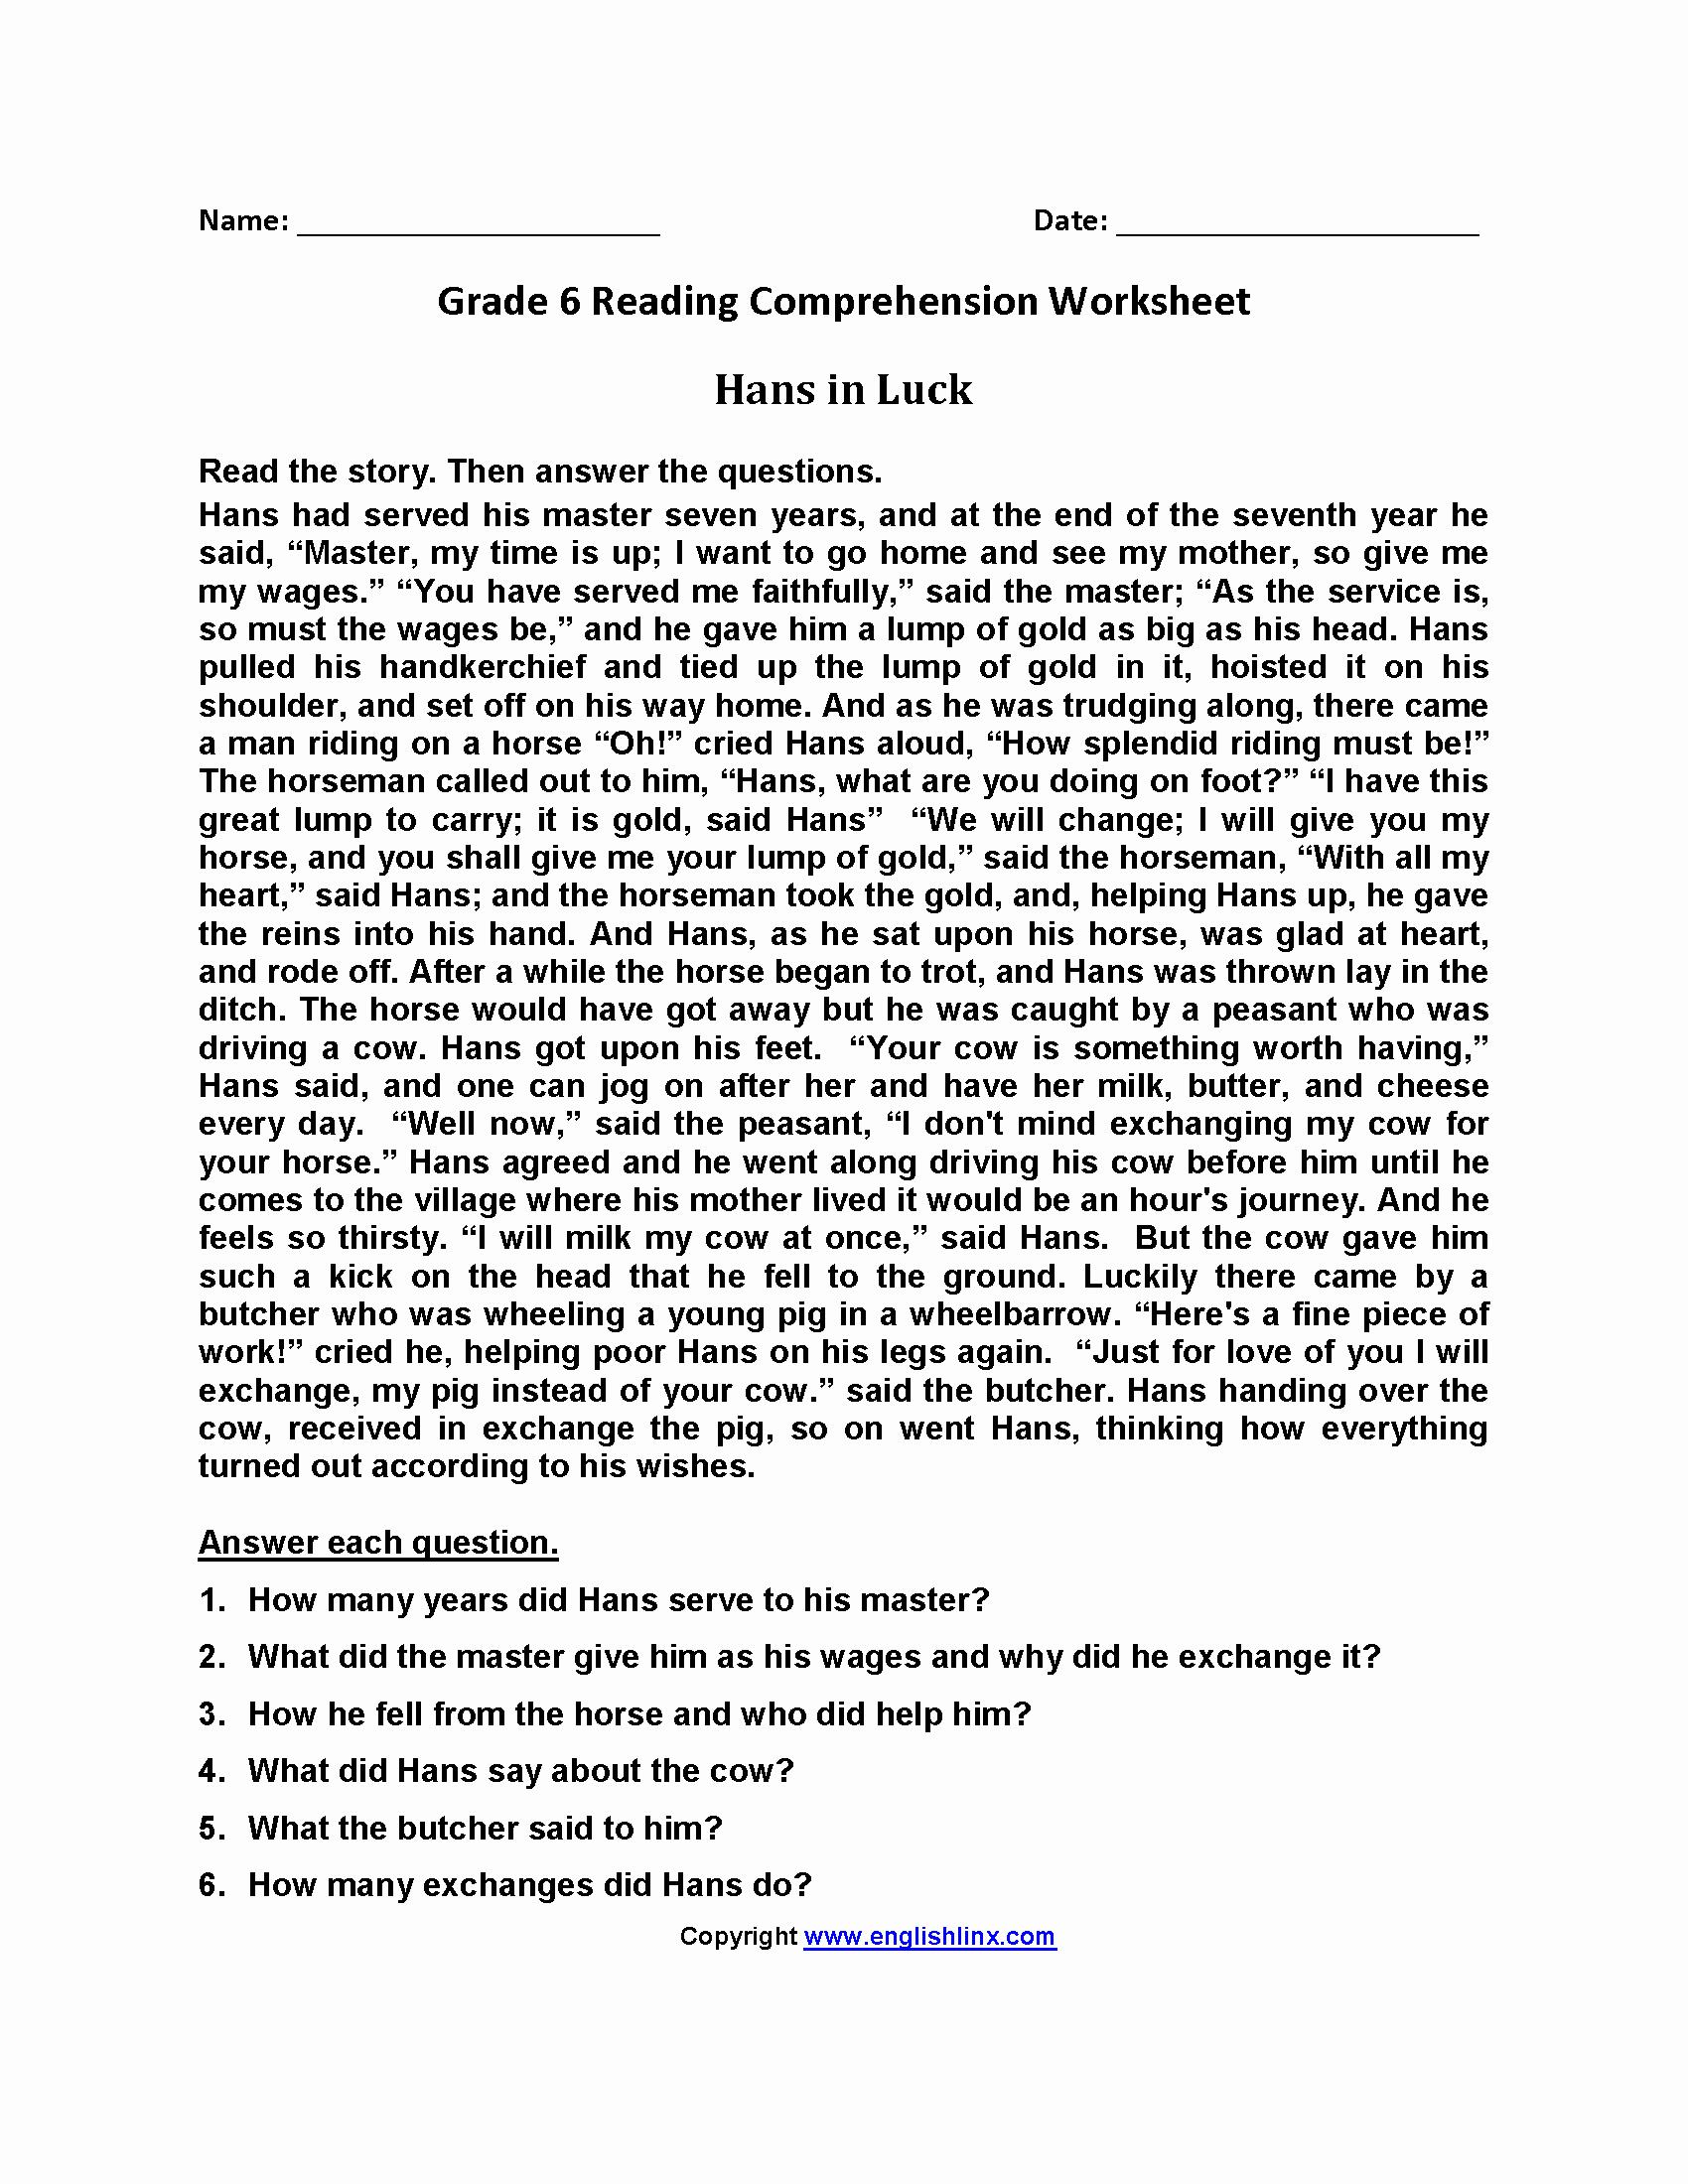 20 Free Printable Reading Comprehension Worksheets For 6Th Grade | Free Printable 6Th Grade Reading Worksheets